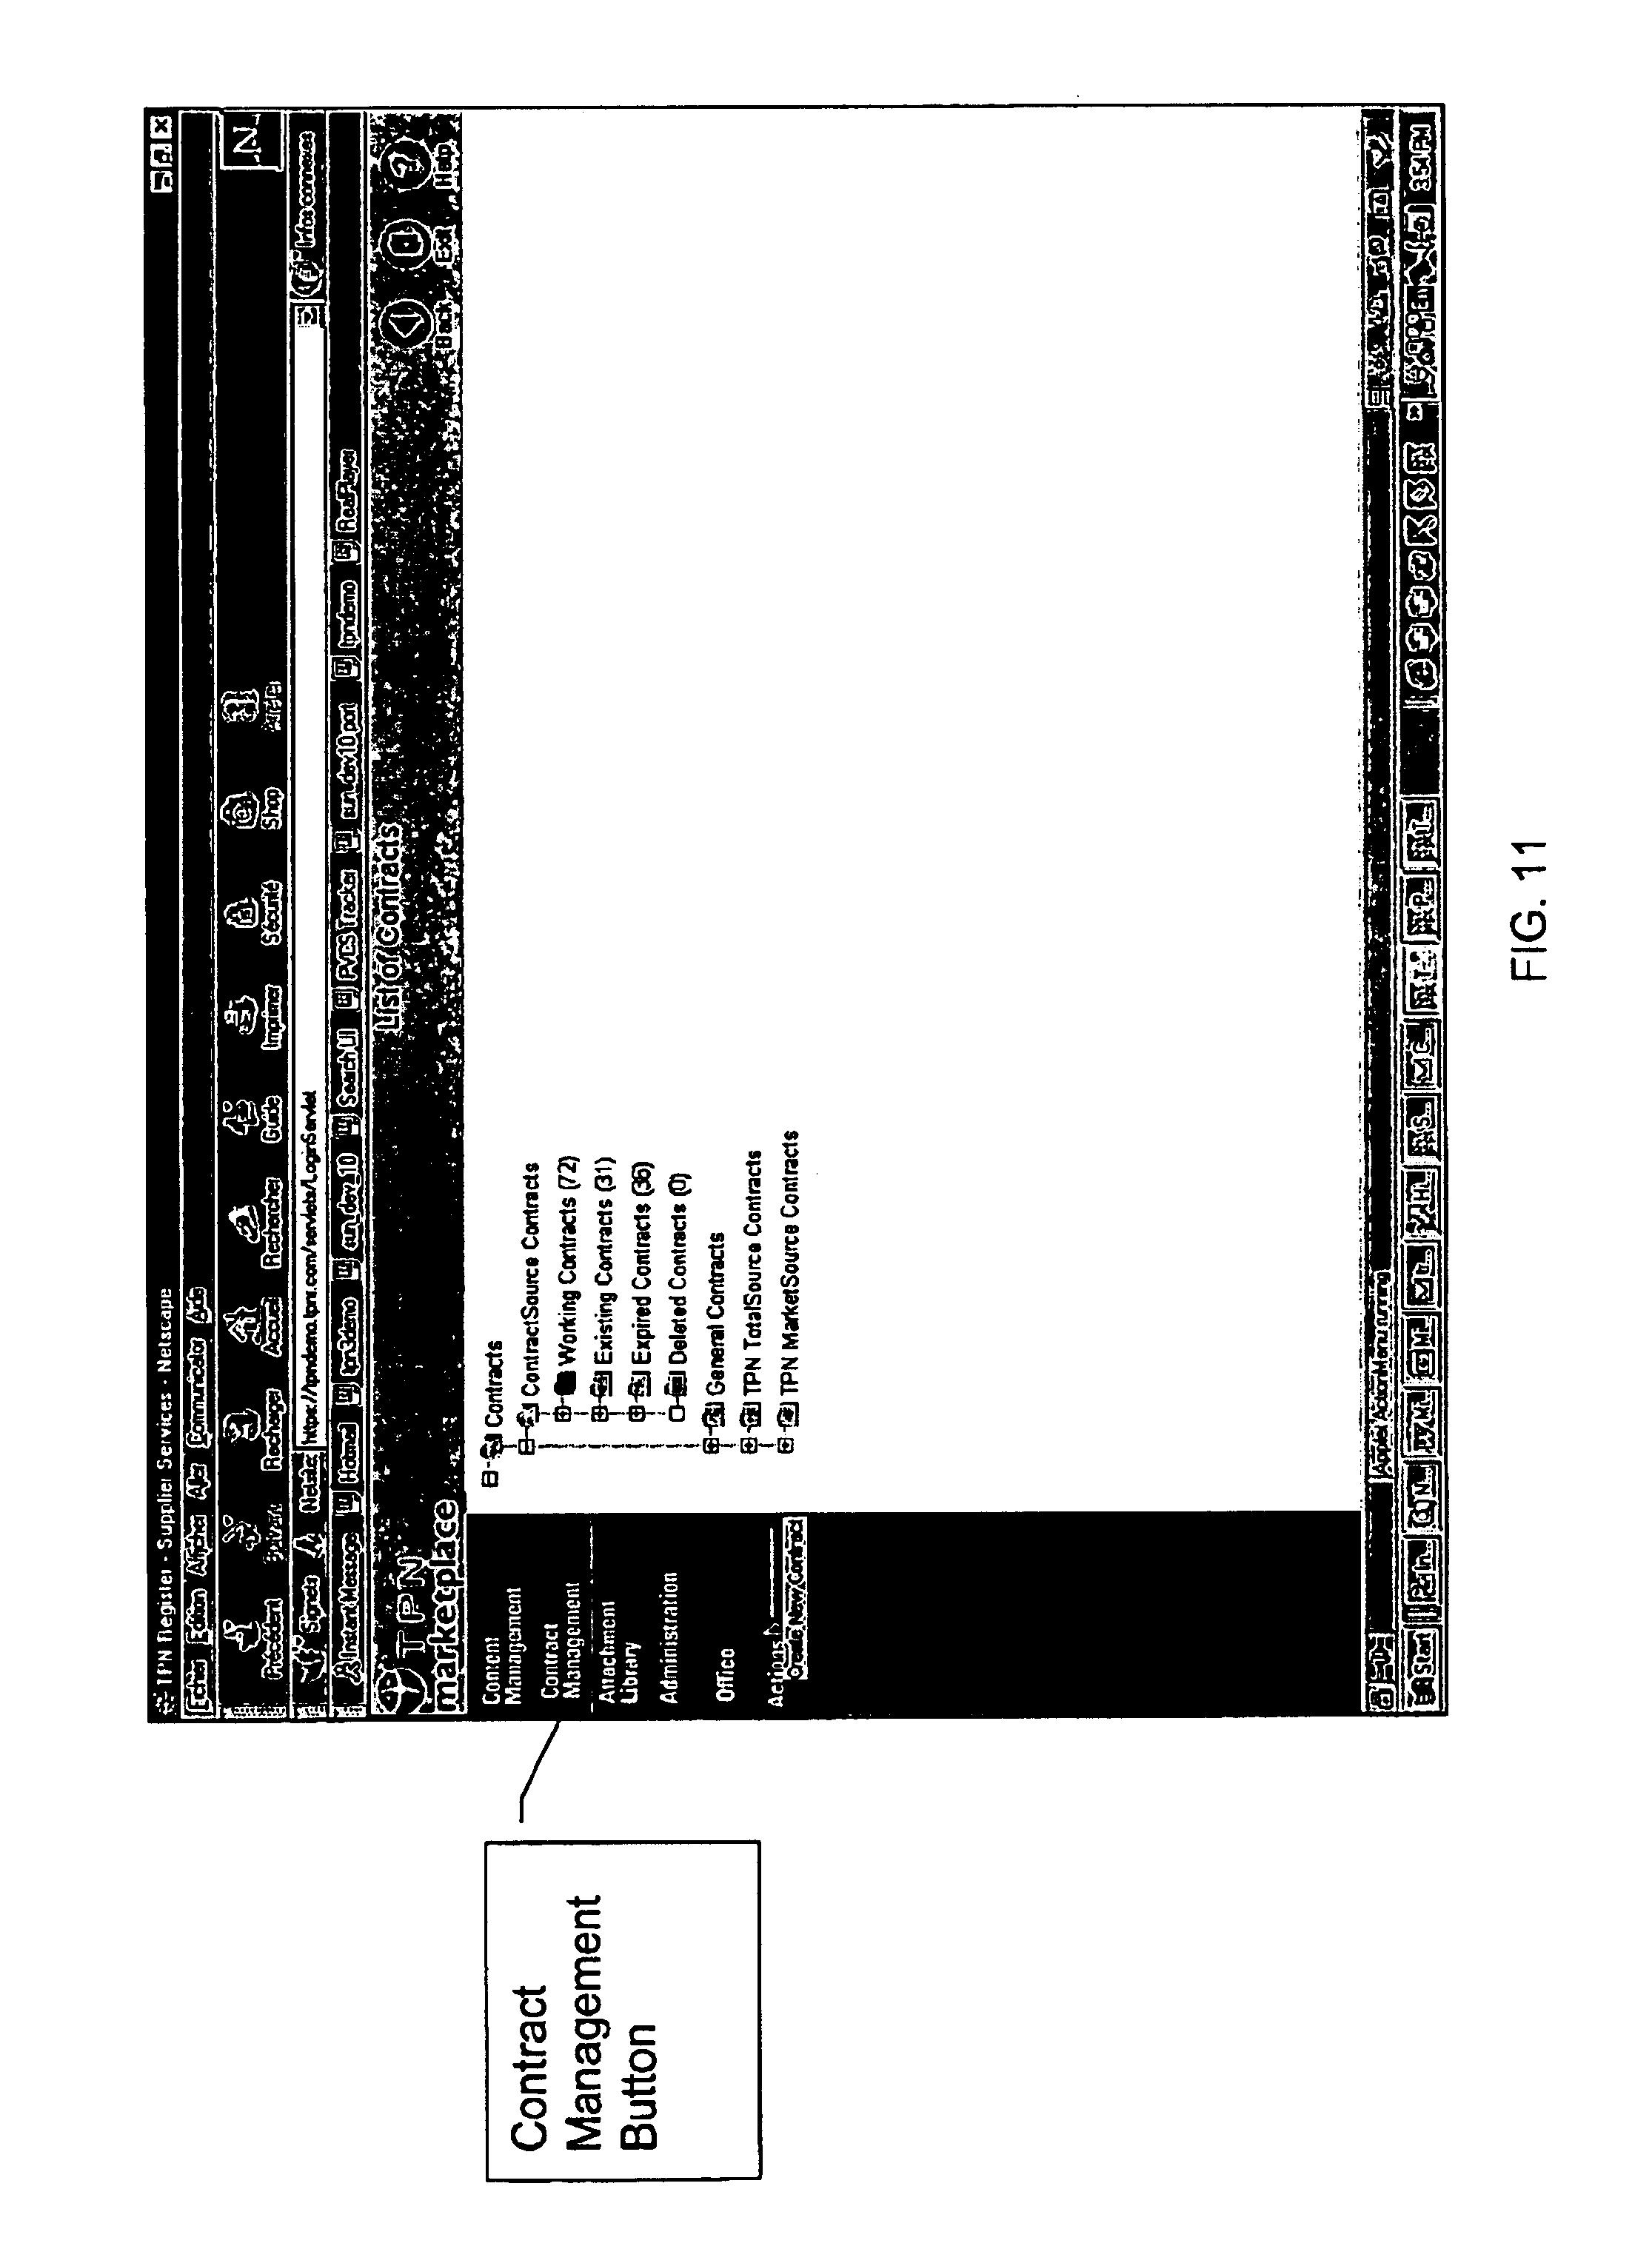 Patent US 6,850,900 B1